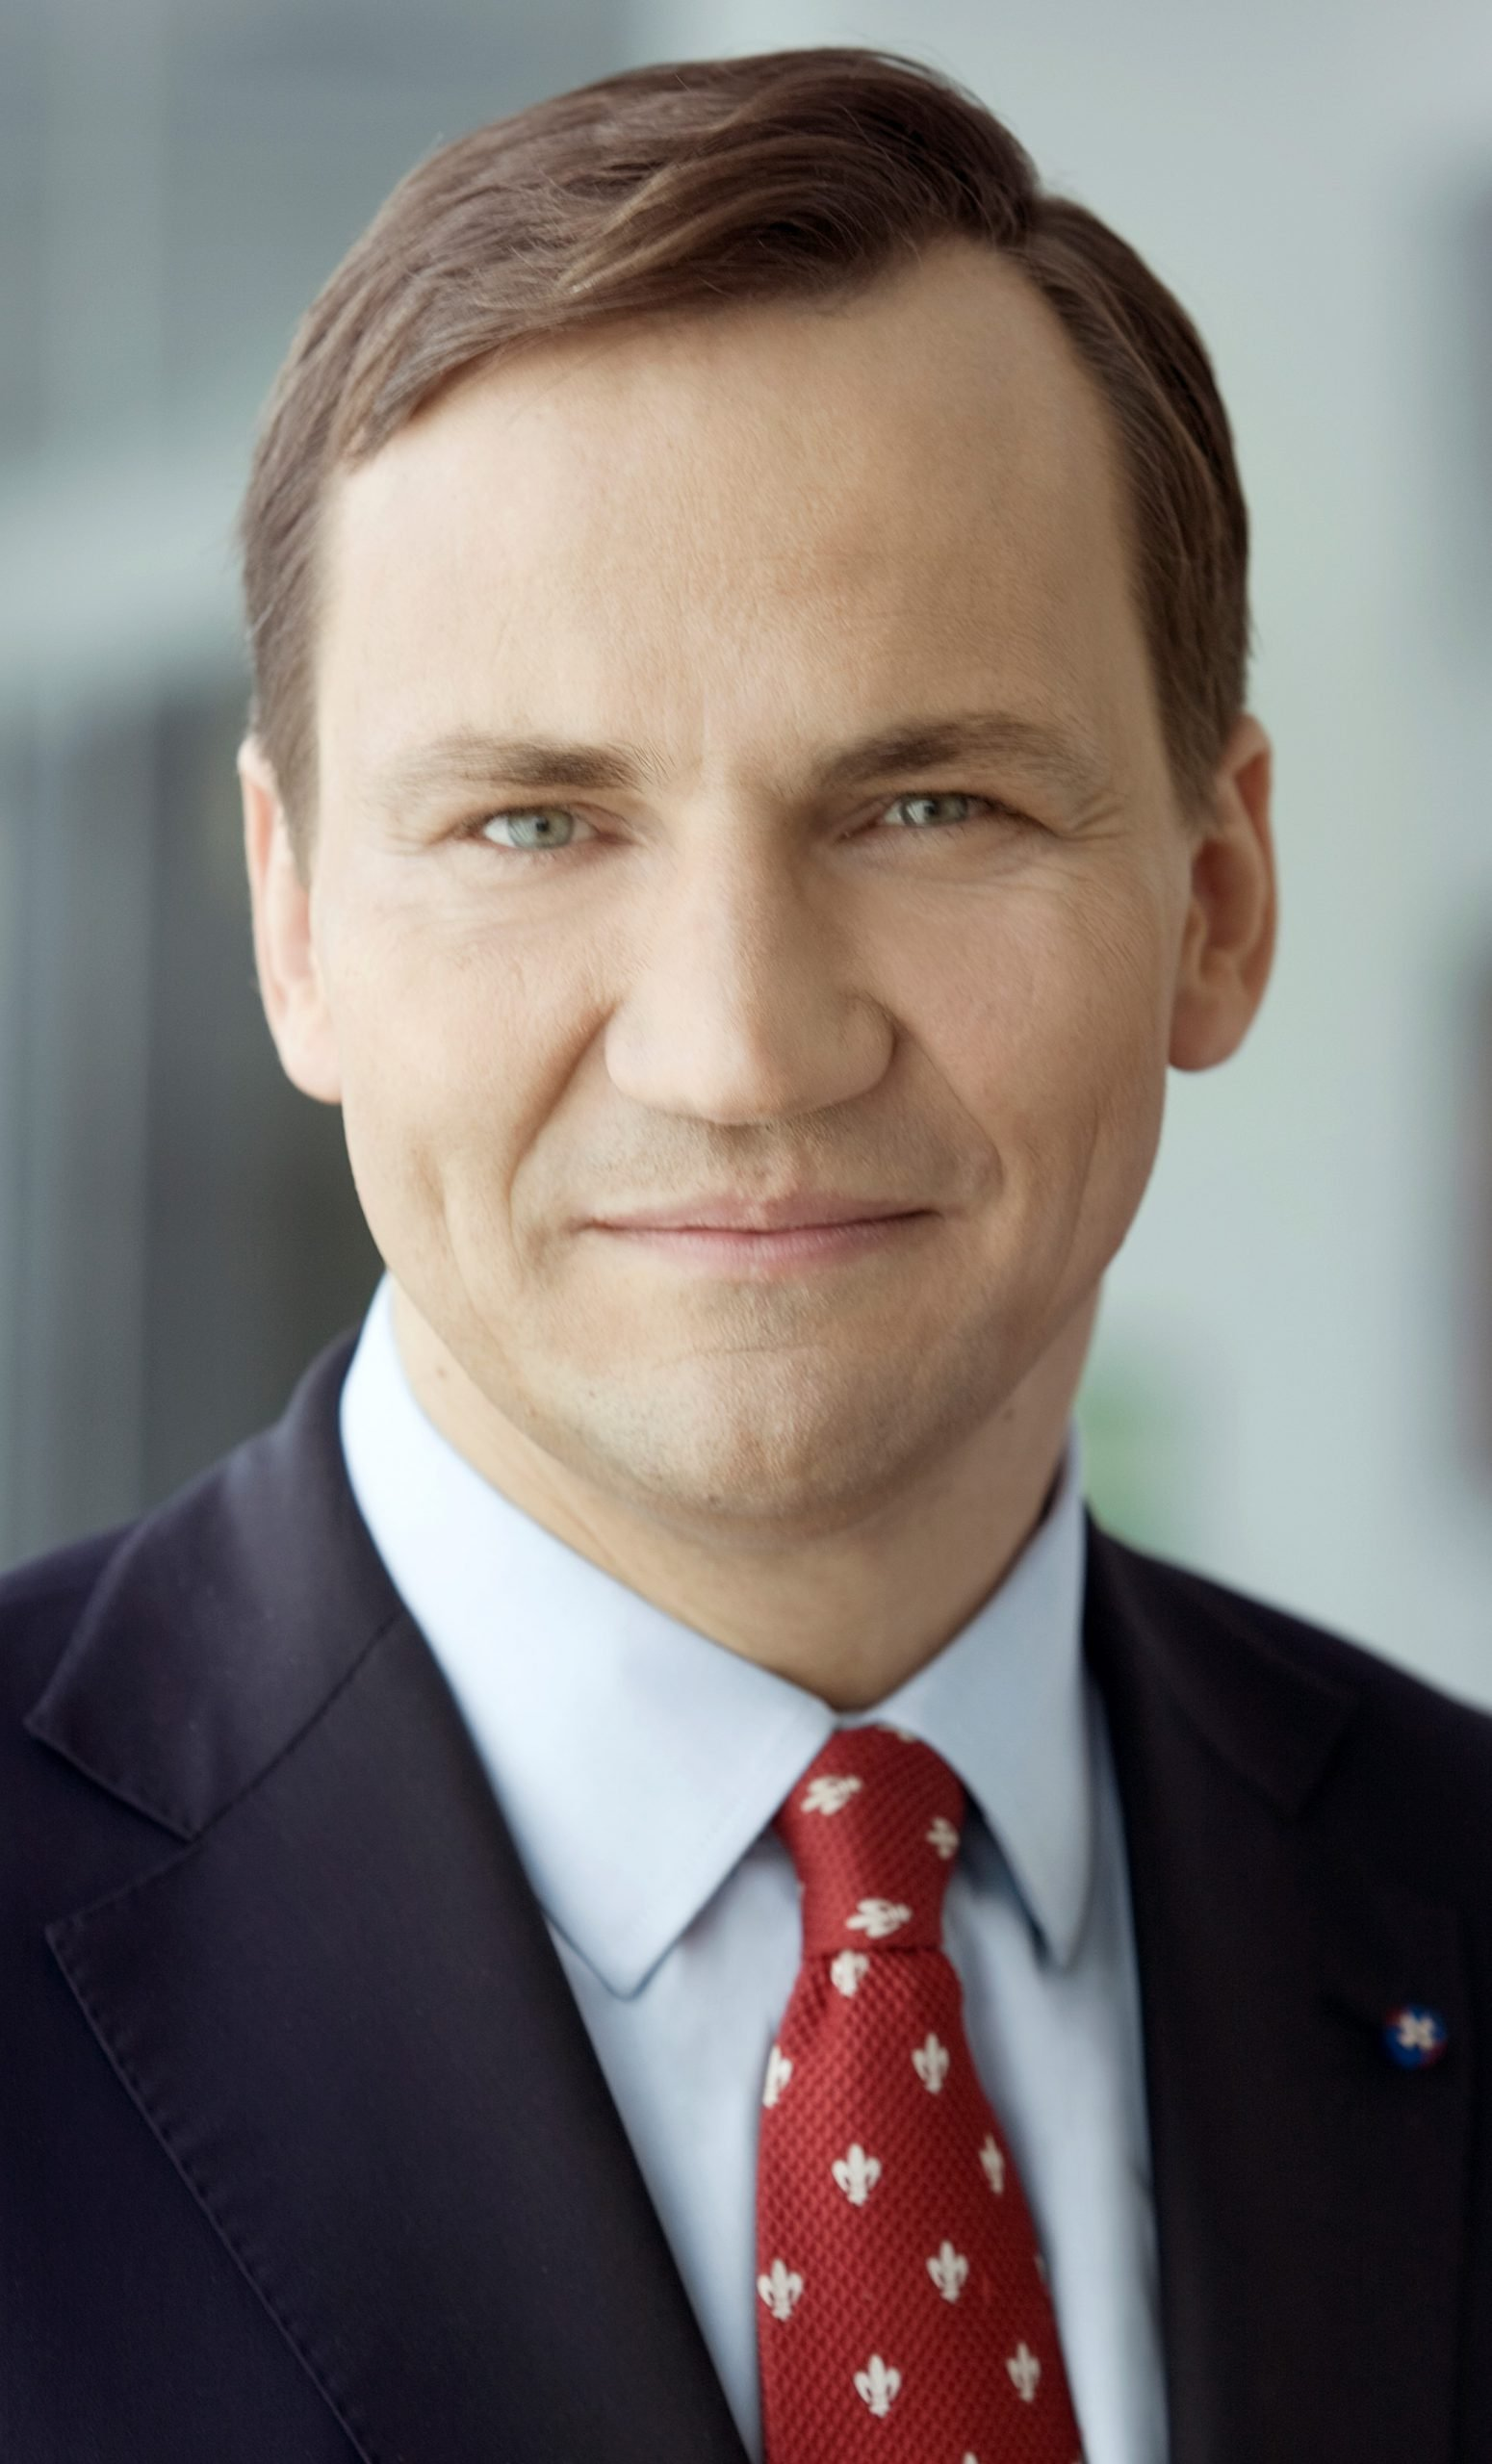 Radek Sikorsk